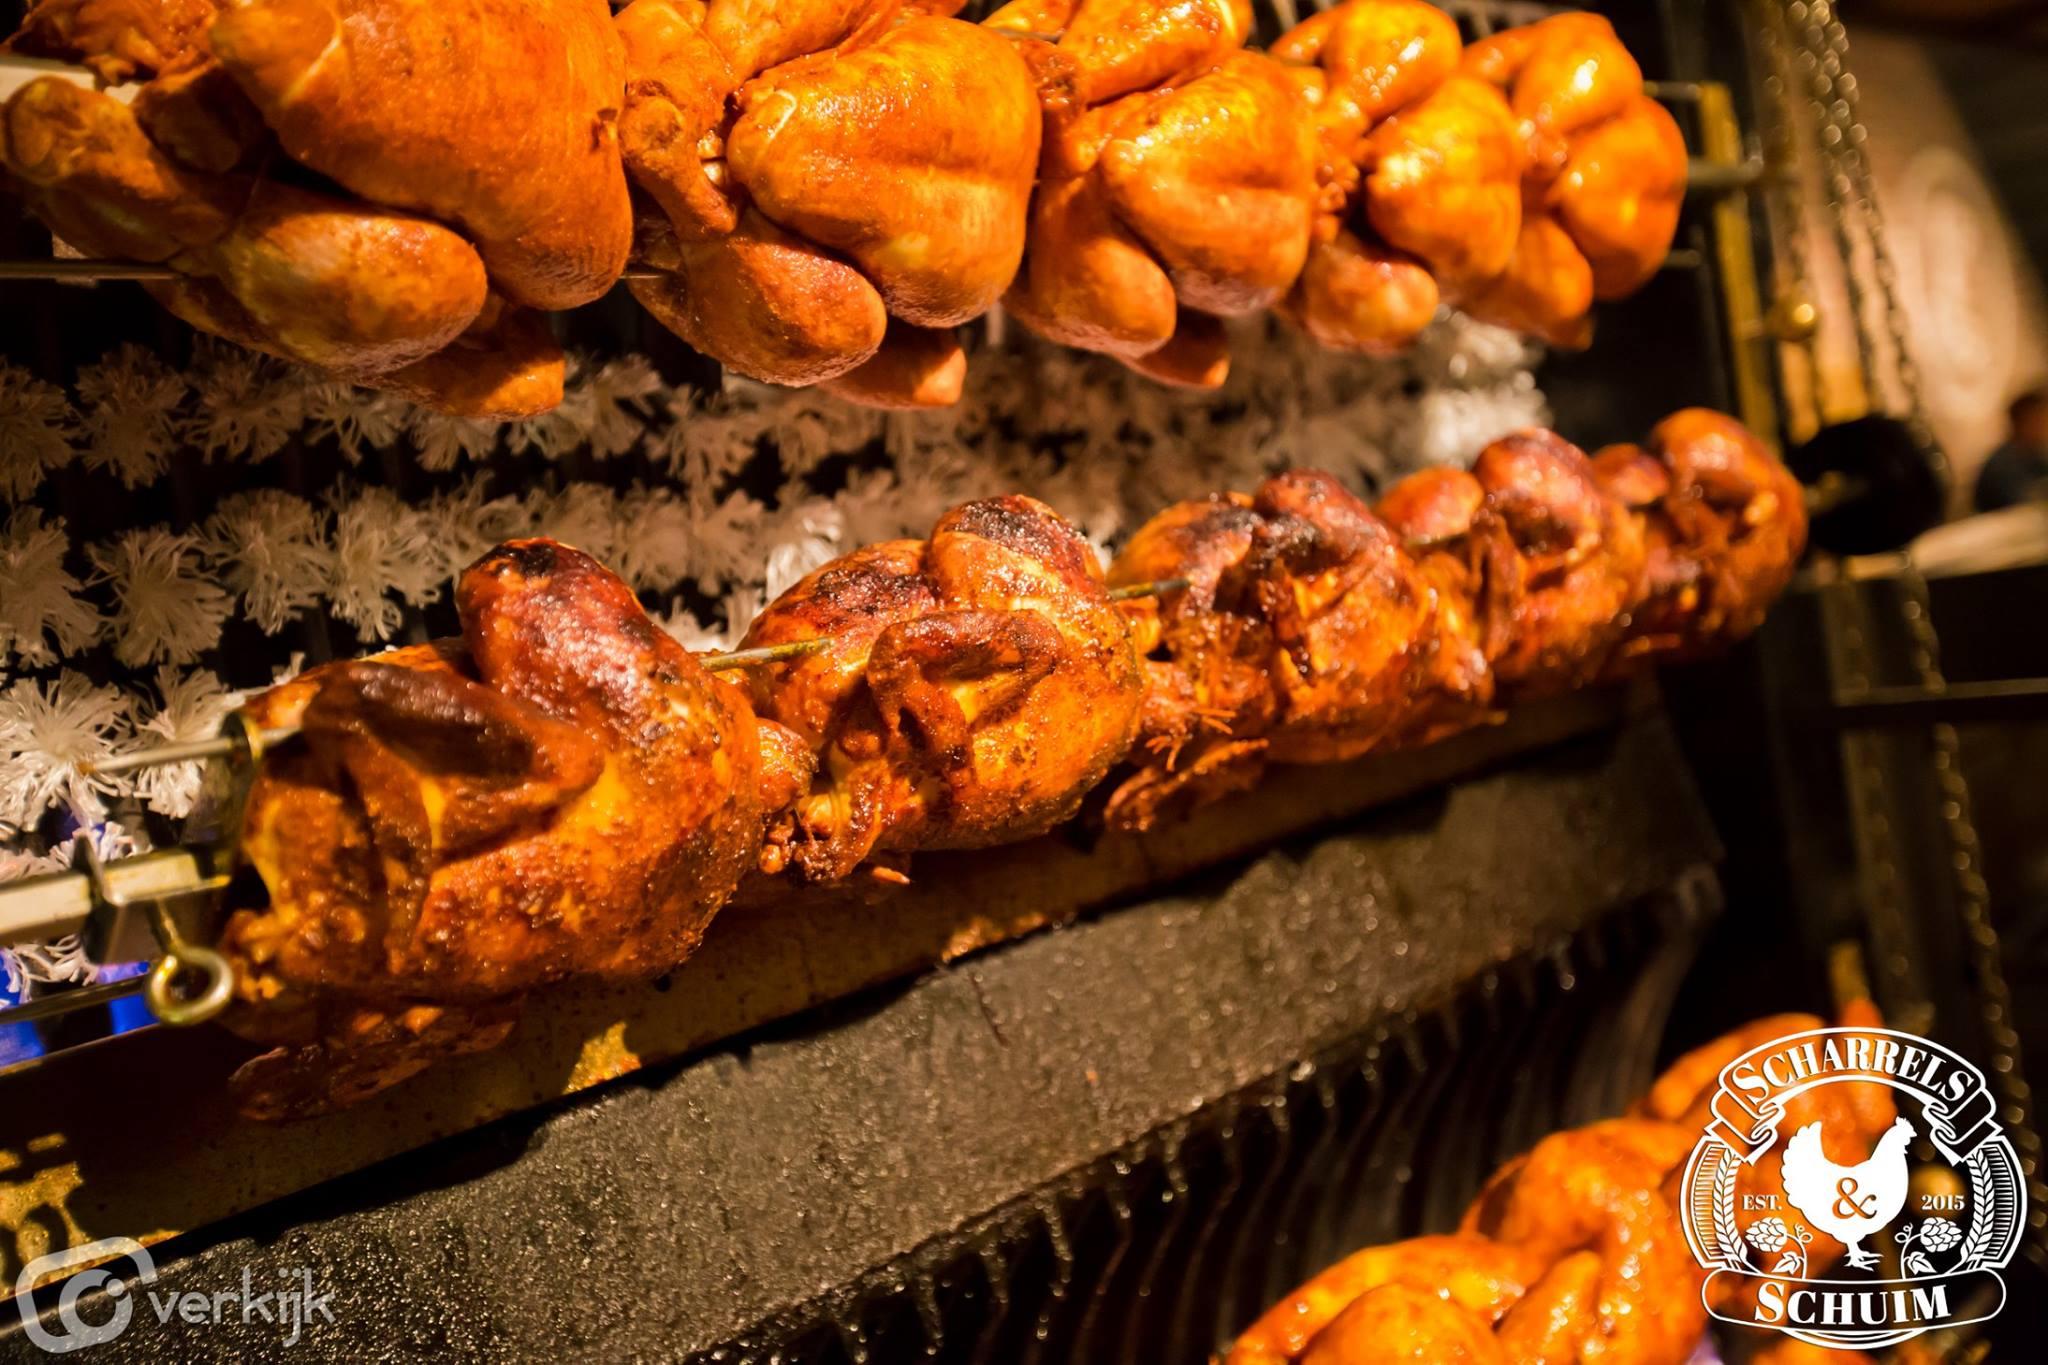 Scharrels en schuim restaurant Rotterdam